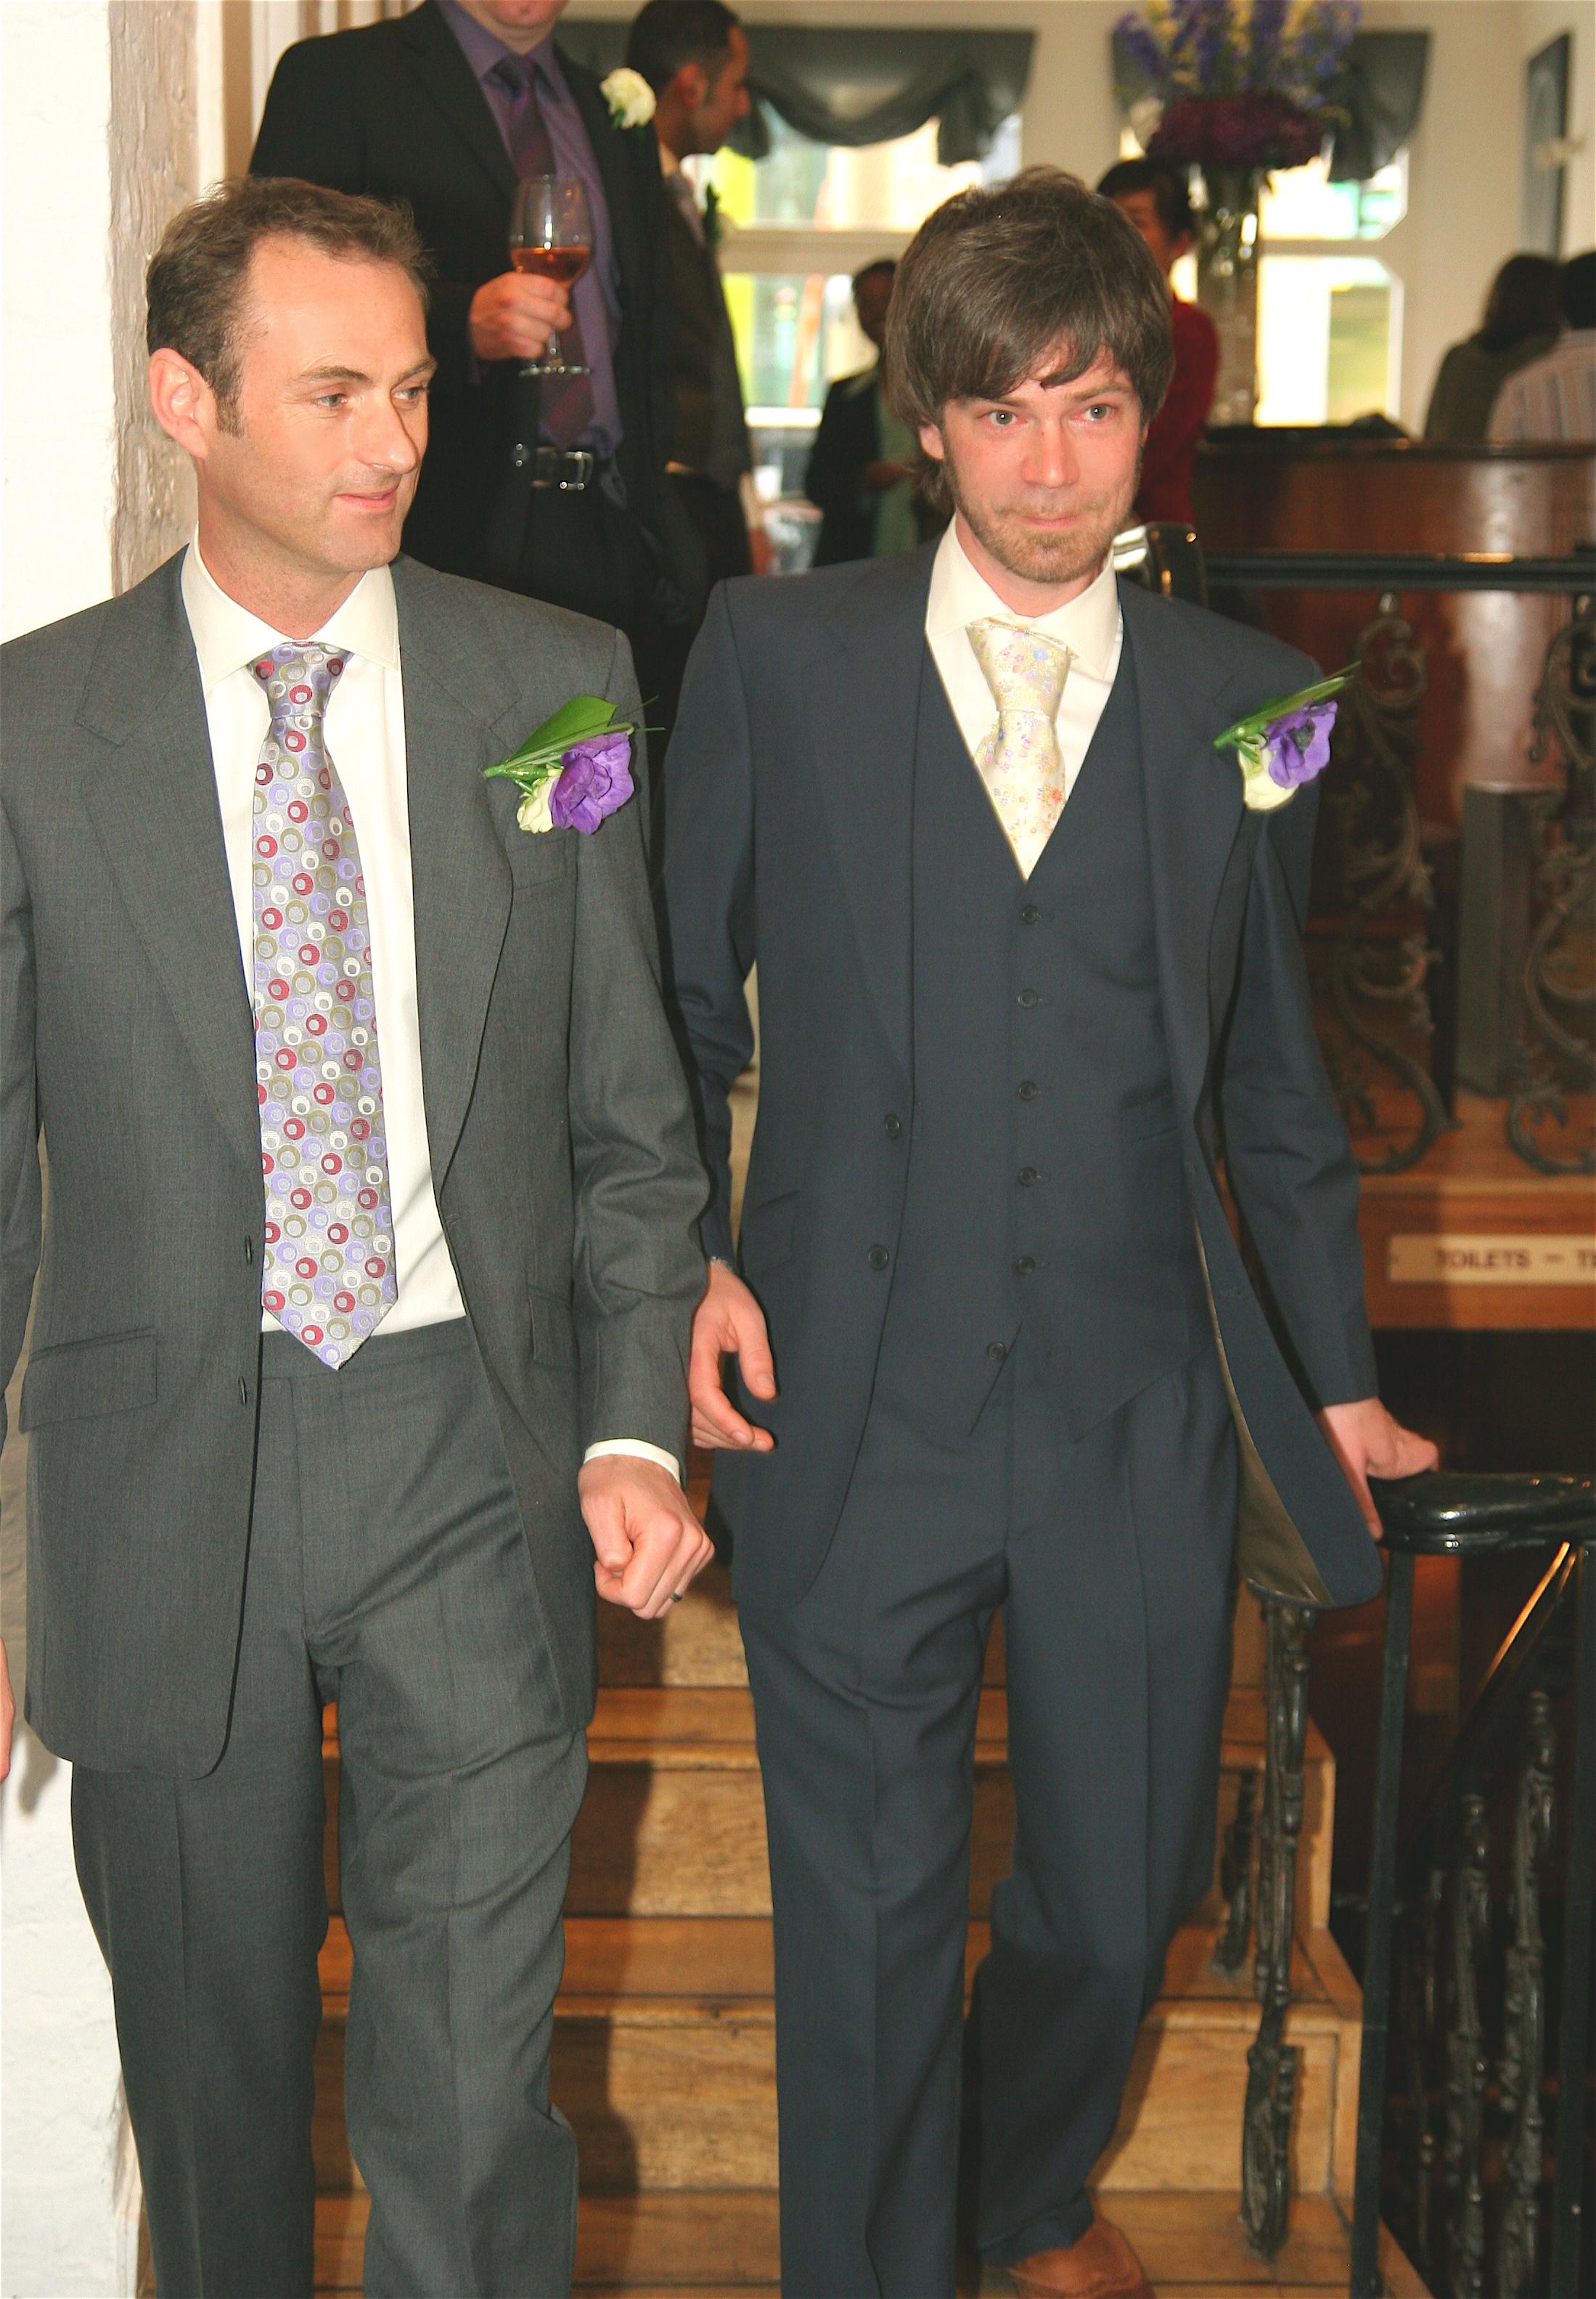 paul-gerrard-wedding-civil-partnership-gay-same-sex-navy-three-piece-suit-grey-two-piece-bespoke-all-uk-made.JPG